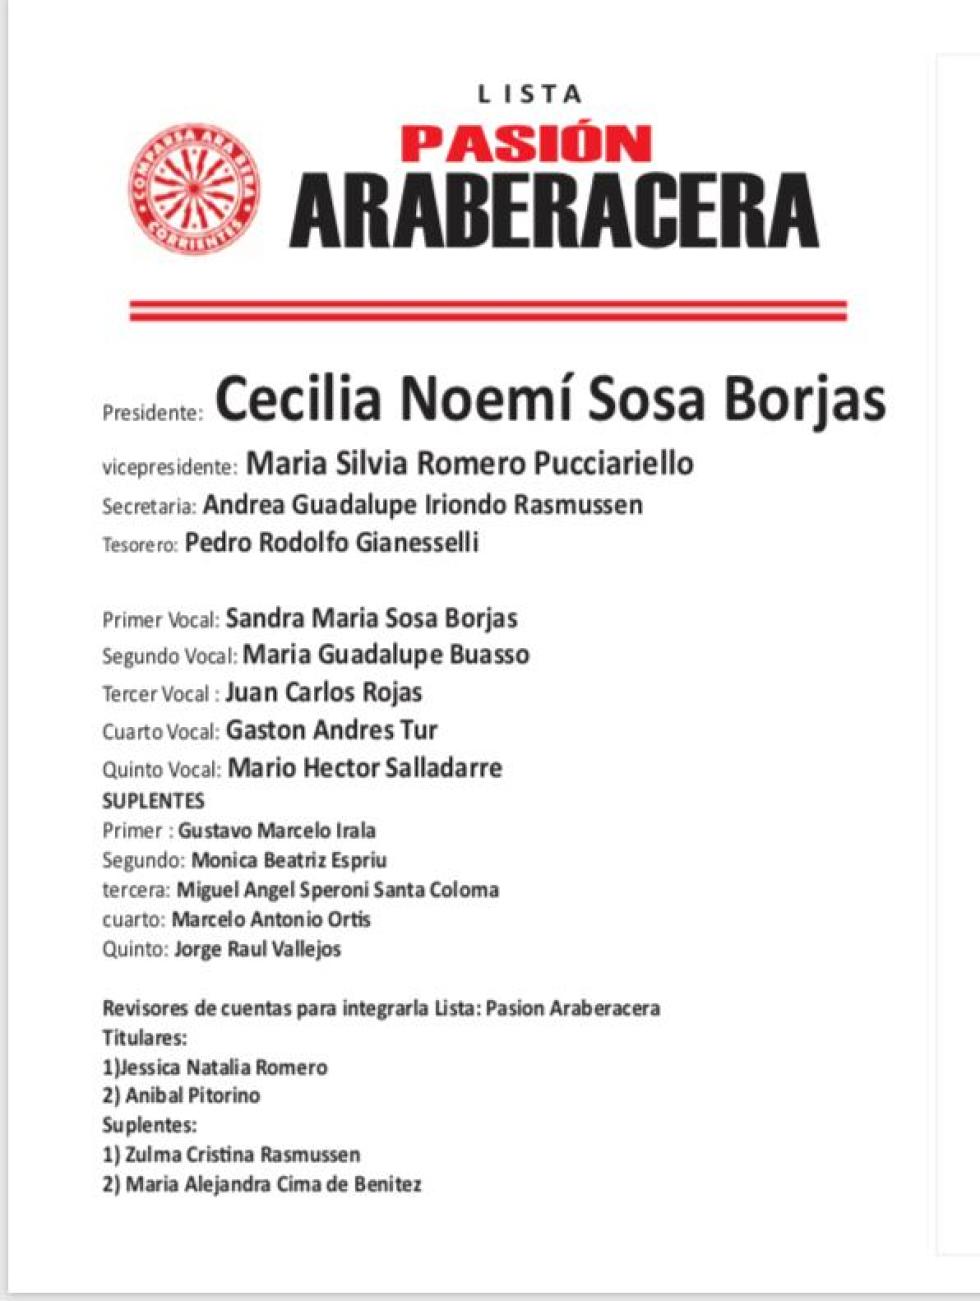 ARA BERA CORRIENTES